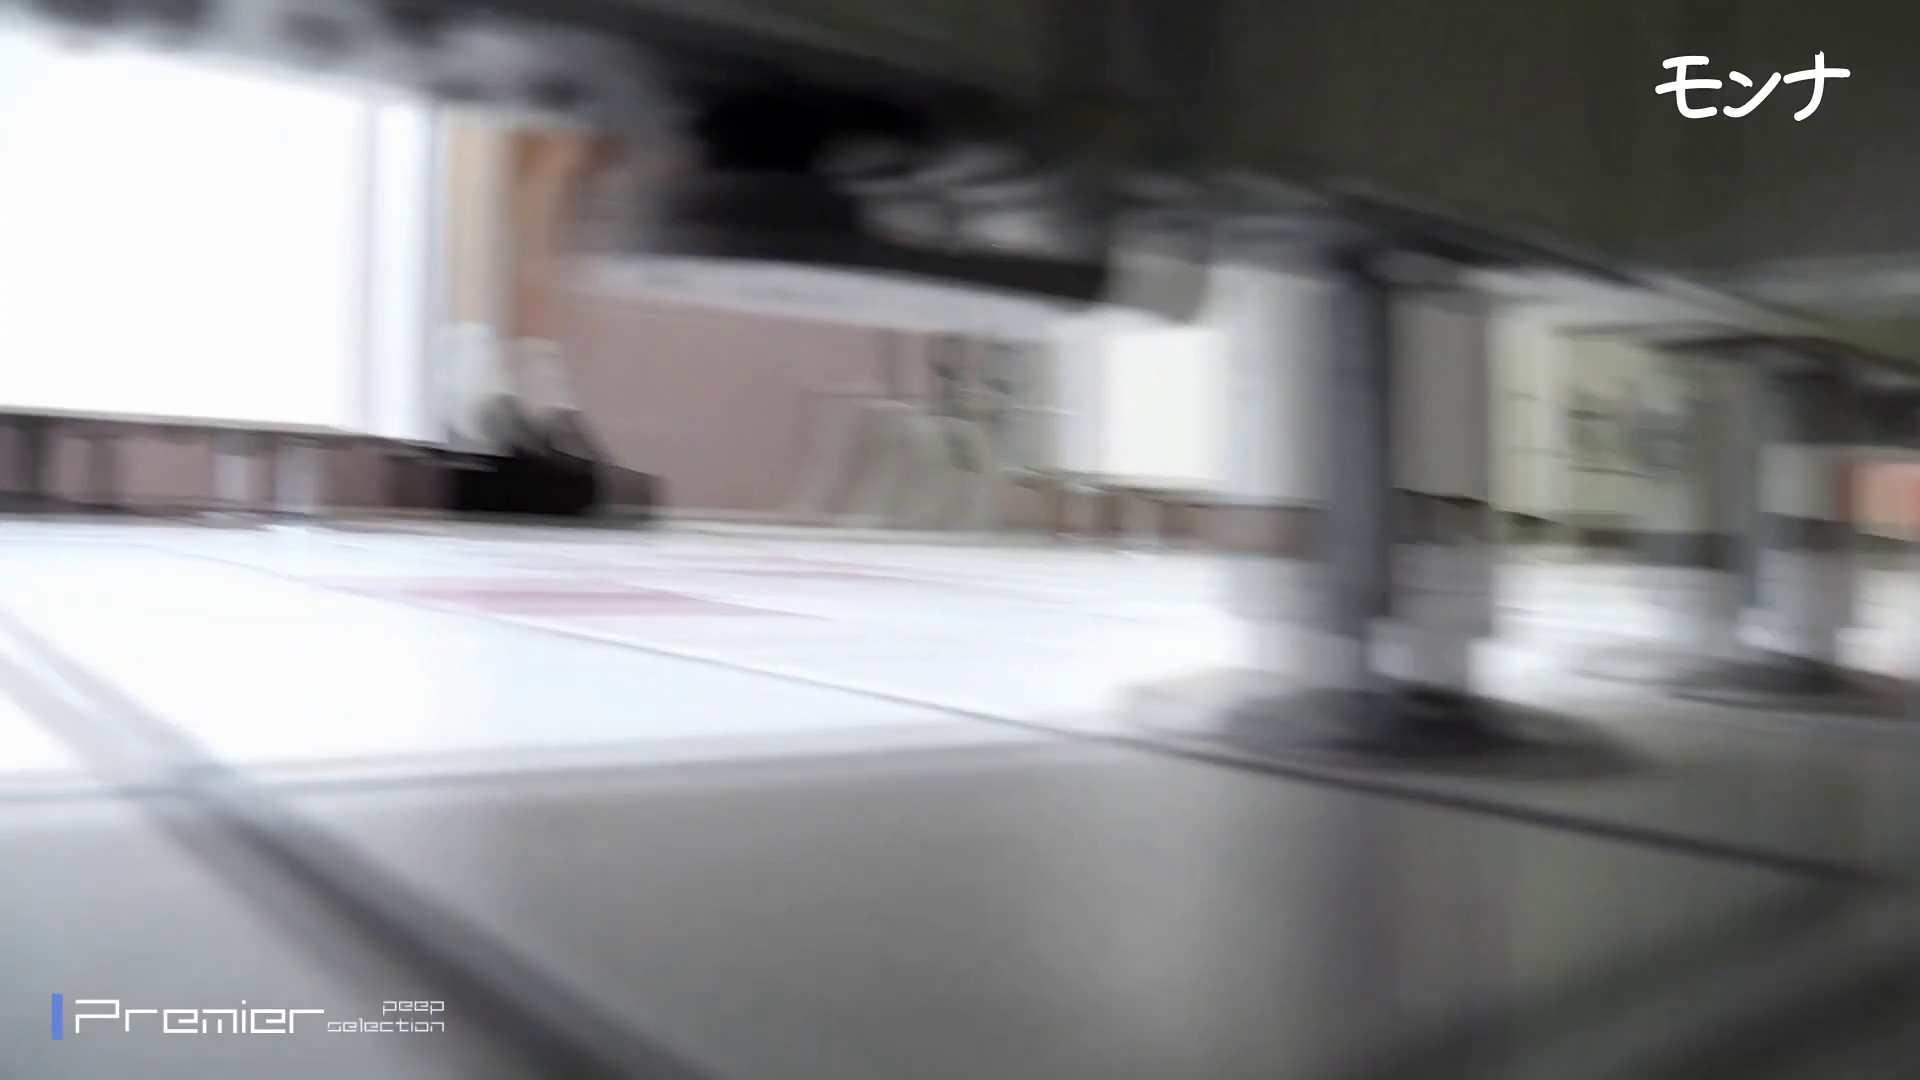 CM 清楚なお女市さんから流れる綺麗な聖水【美しい日本の未来 No.125】 高評価 AV無料動画キャプチャ 107枚 95